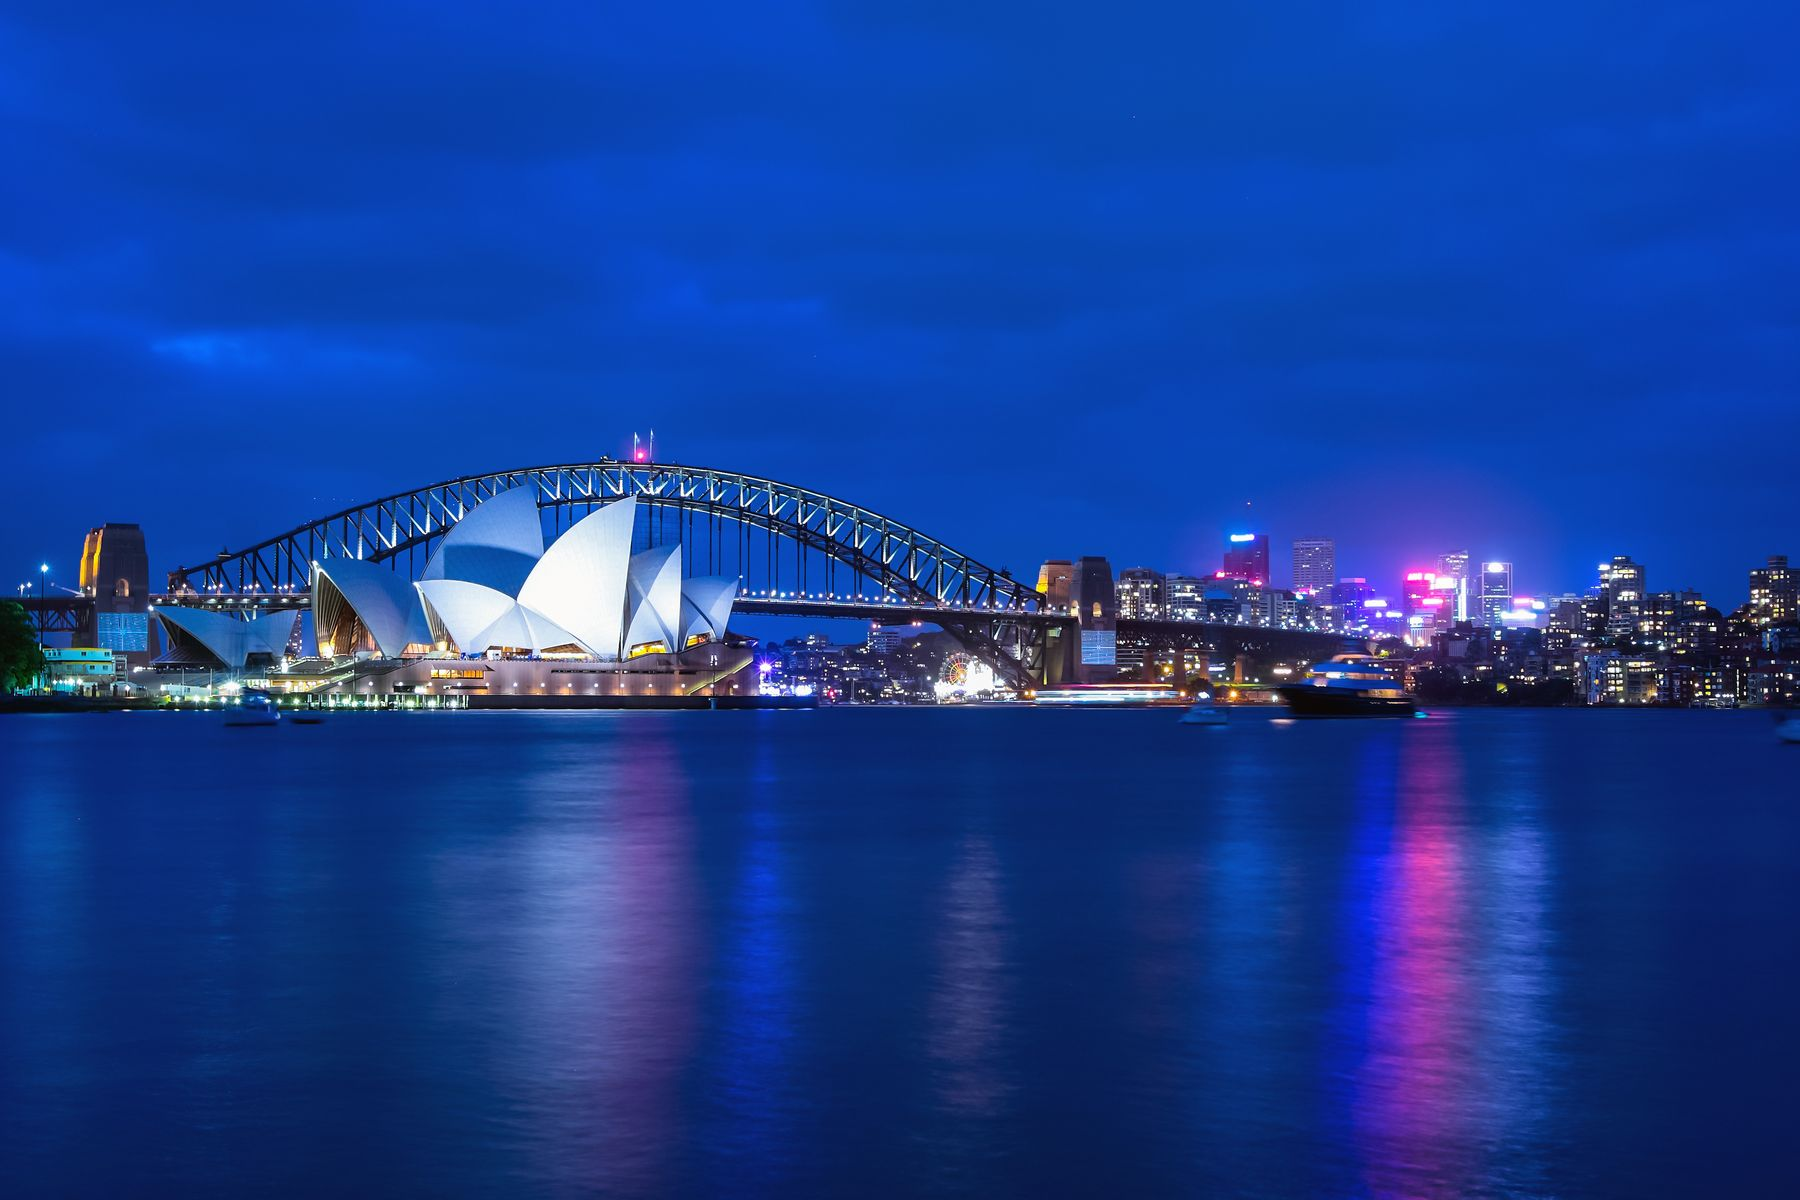 ivew of Sydney opera house at night